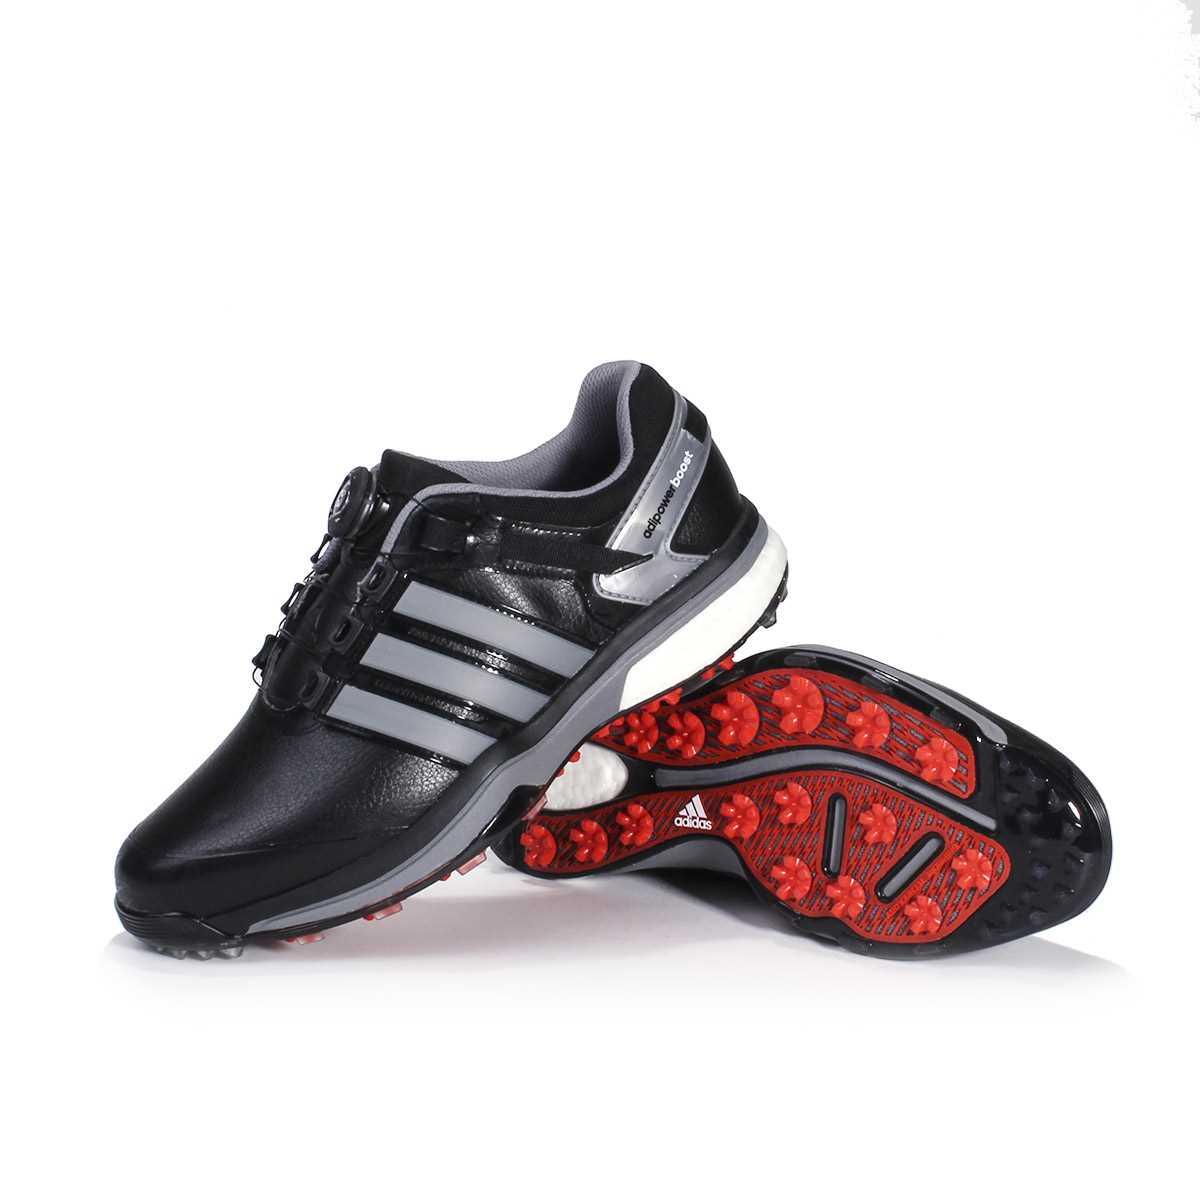 half off 7b167 9a8b6 adidas Mens adiPower Boost BOA Golf Shoes - BlackIron